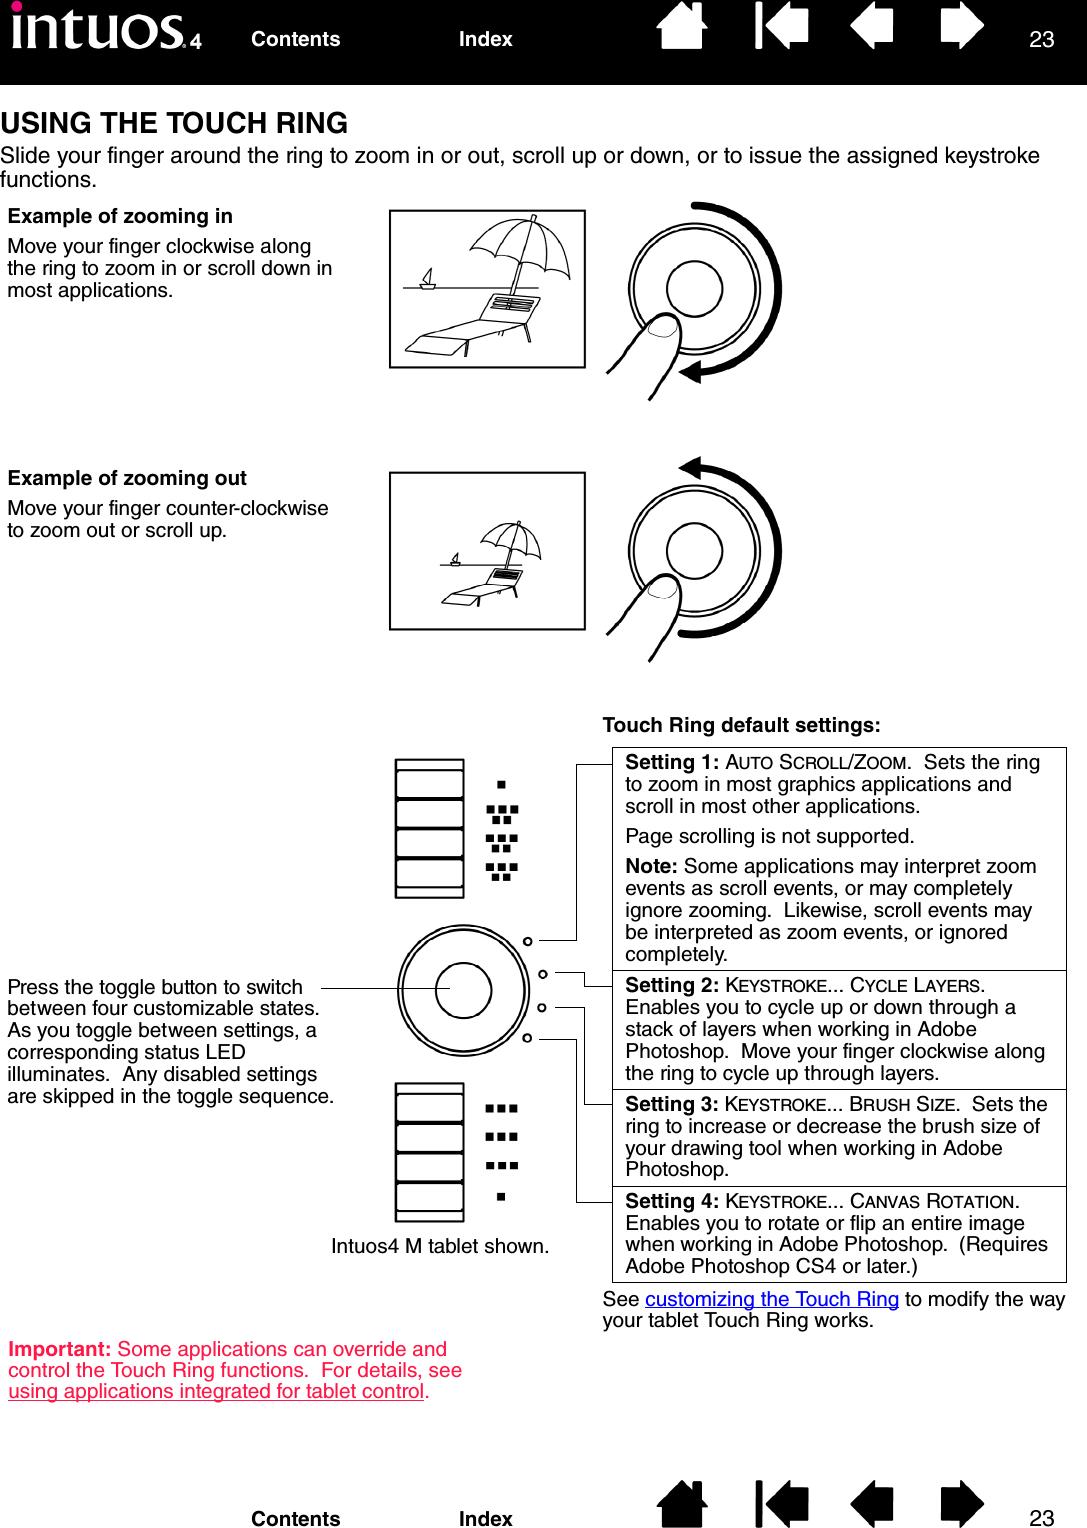 Wacom Co PTK Digitizer User Manual Intuos4 User s Manual